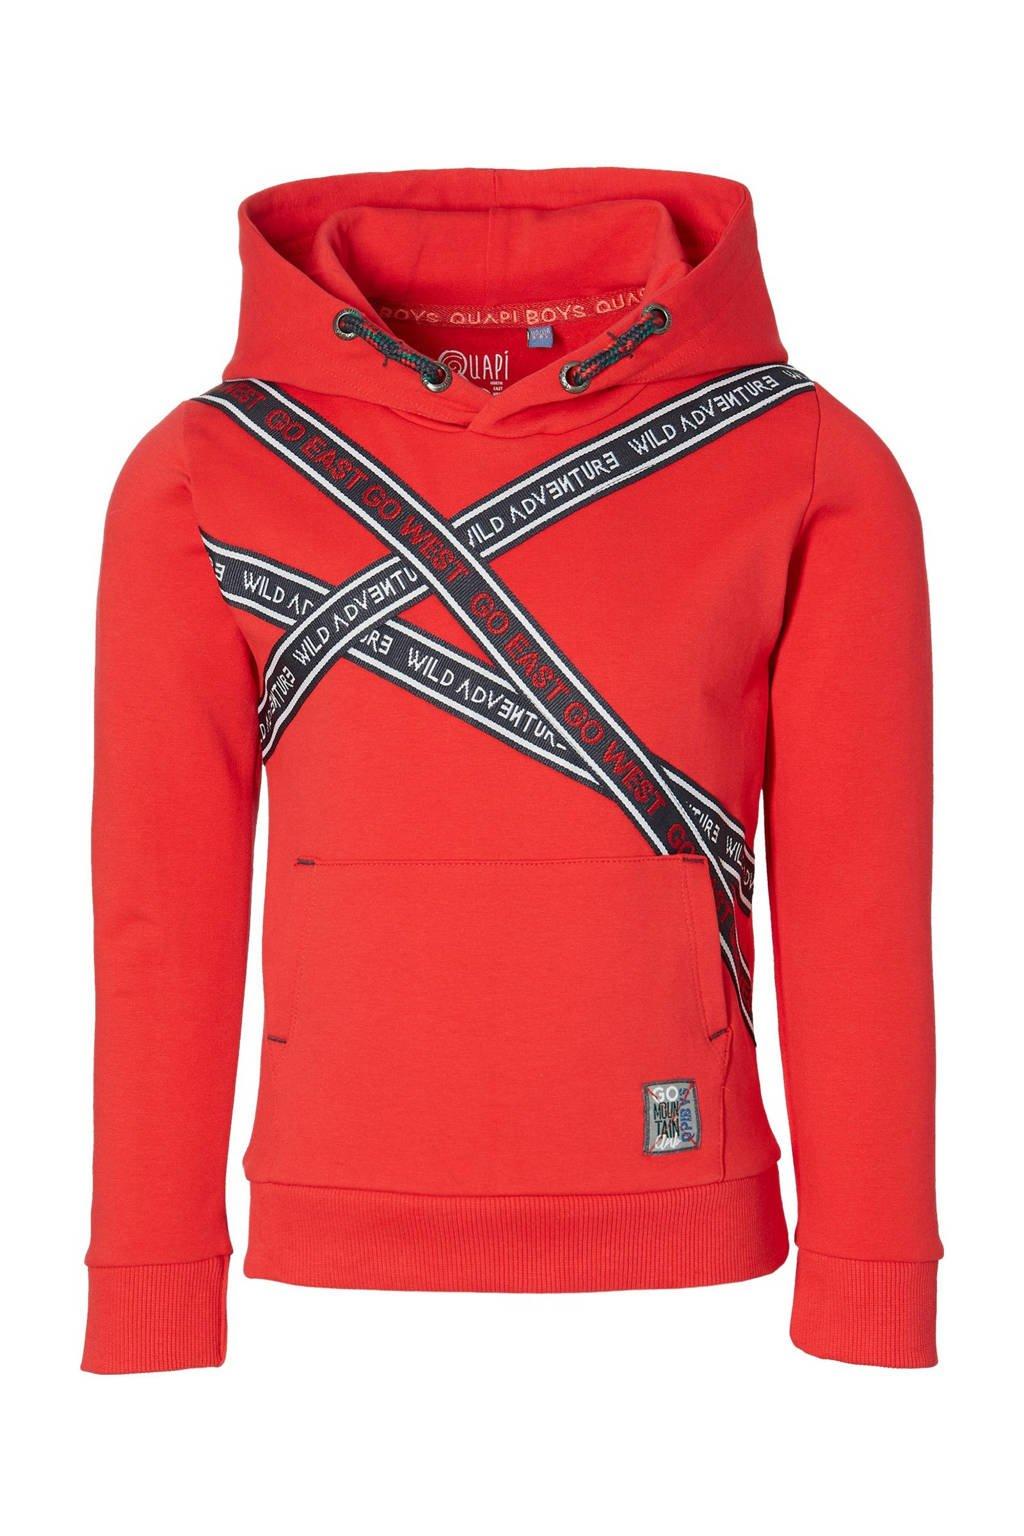 Quapi hoodie Denny met printopdruk rood, Rood